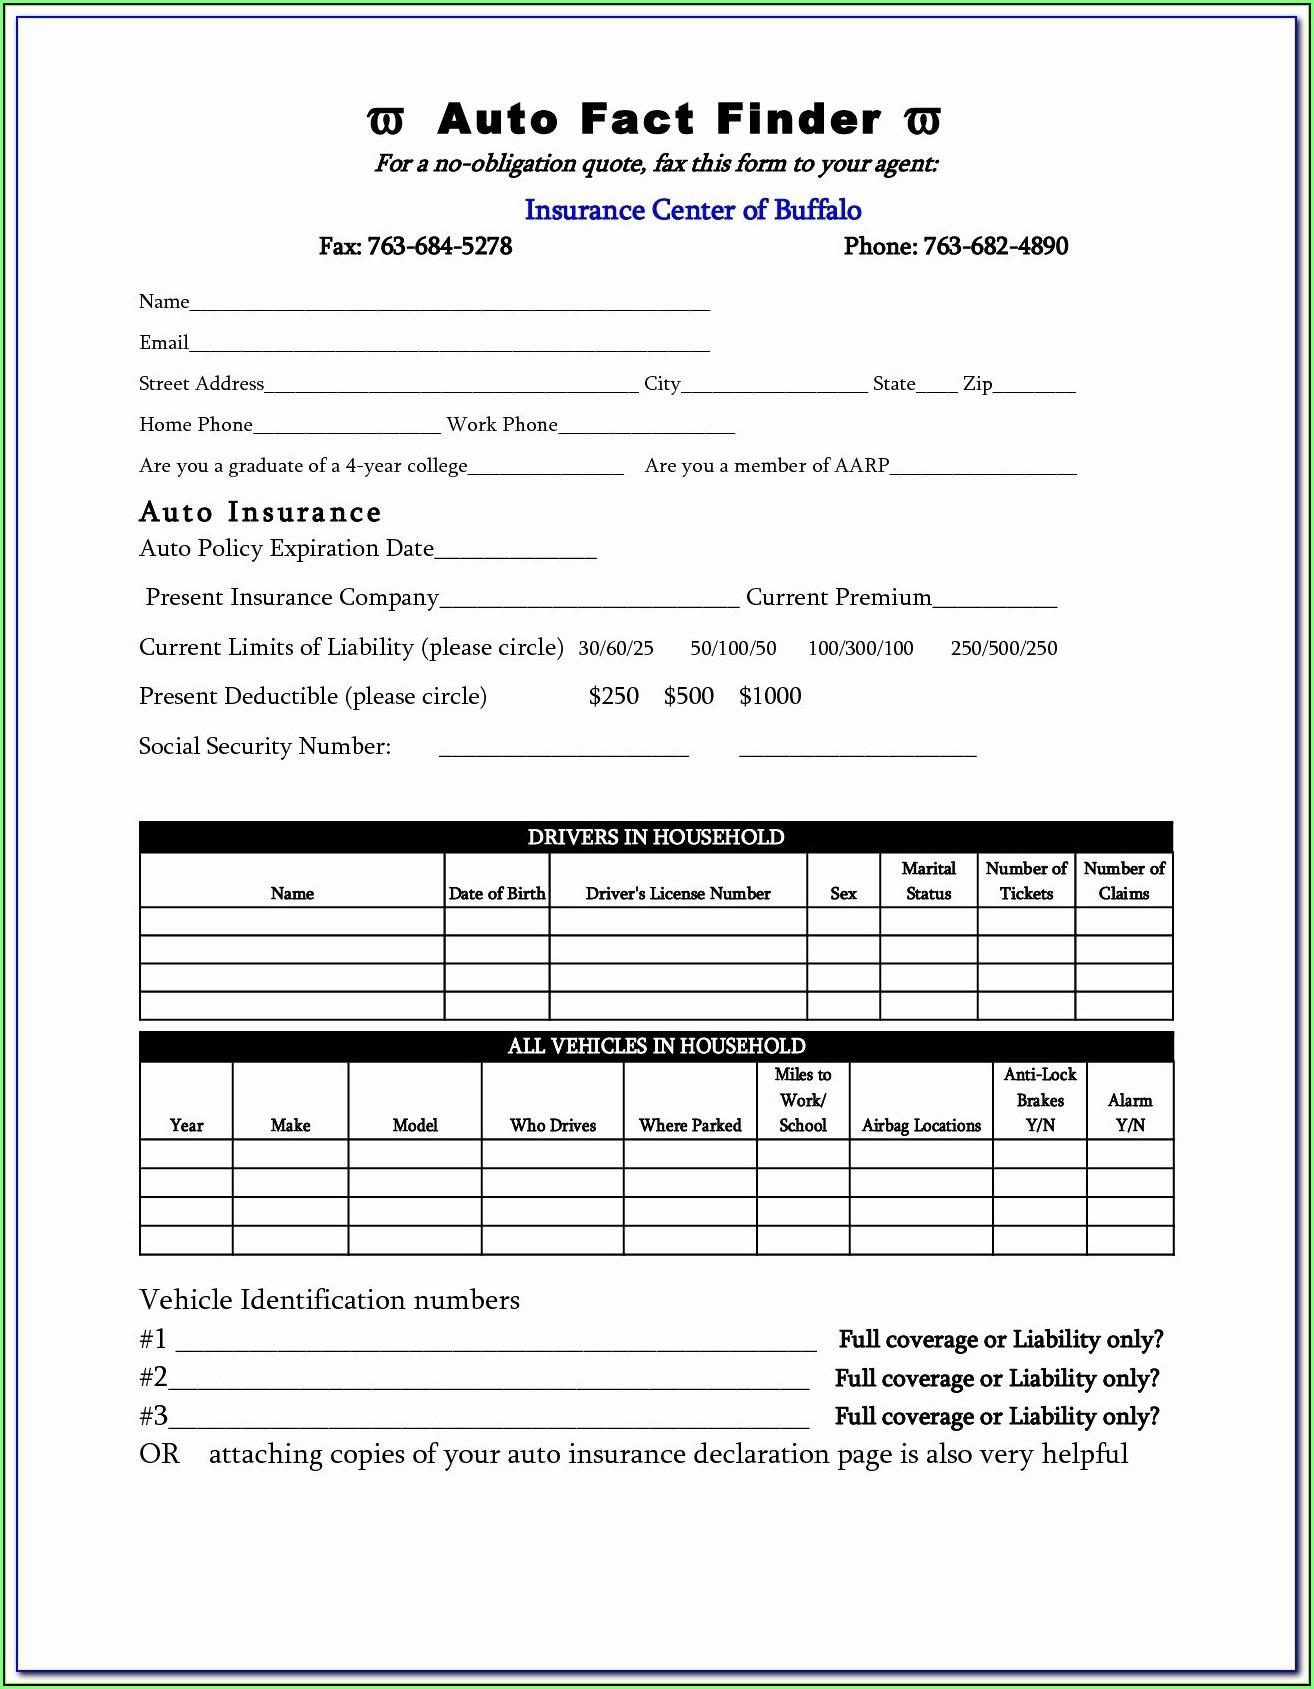 Aarp Supplemental Insurance Application Form